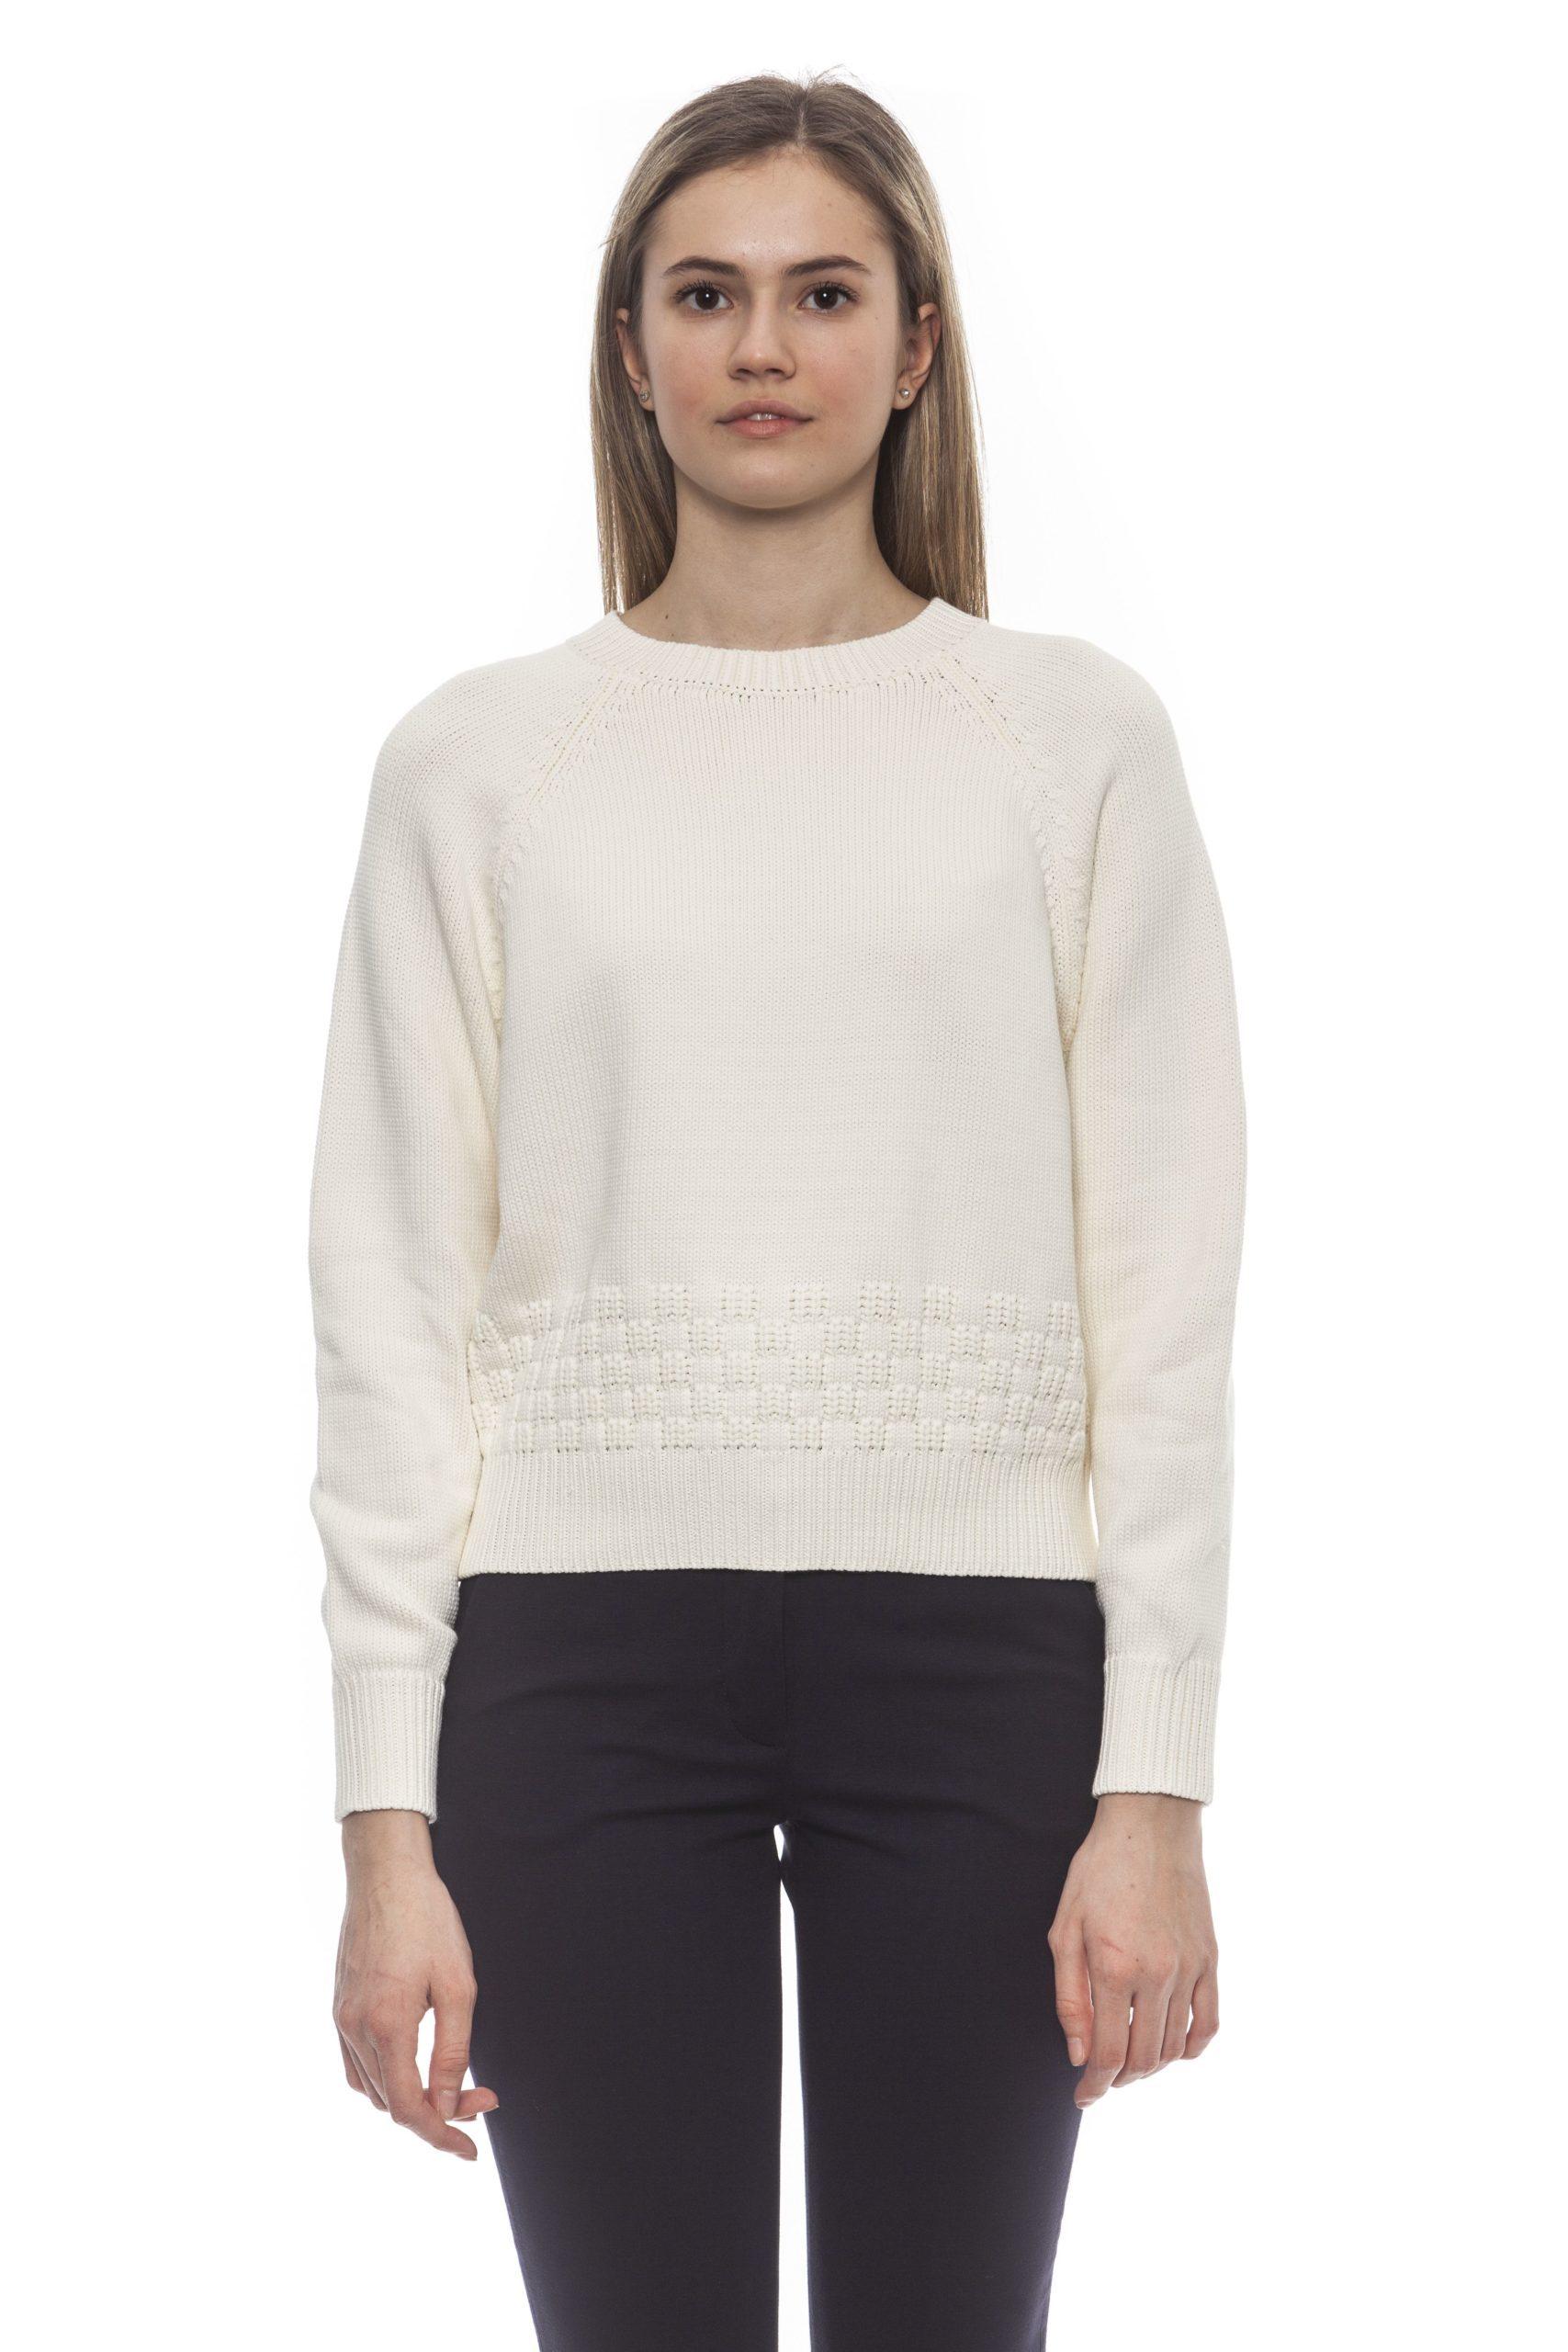 Peserico Women's Bianco Sweater White PE1383073 - IT42 | S